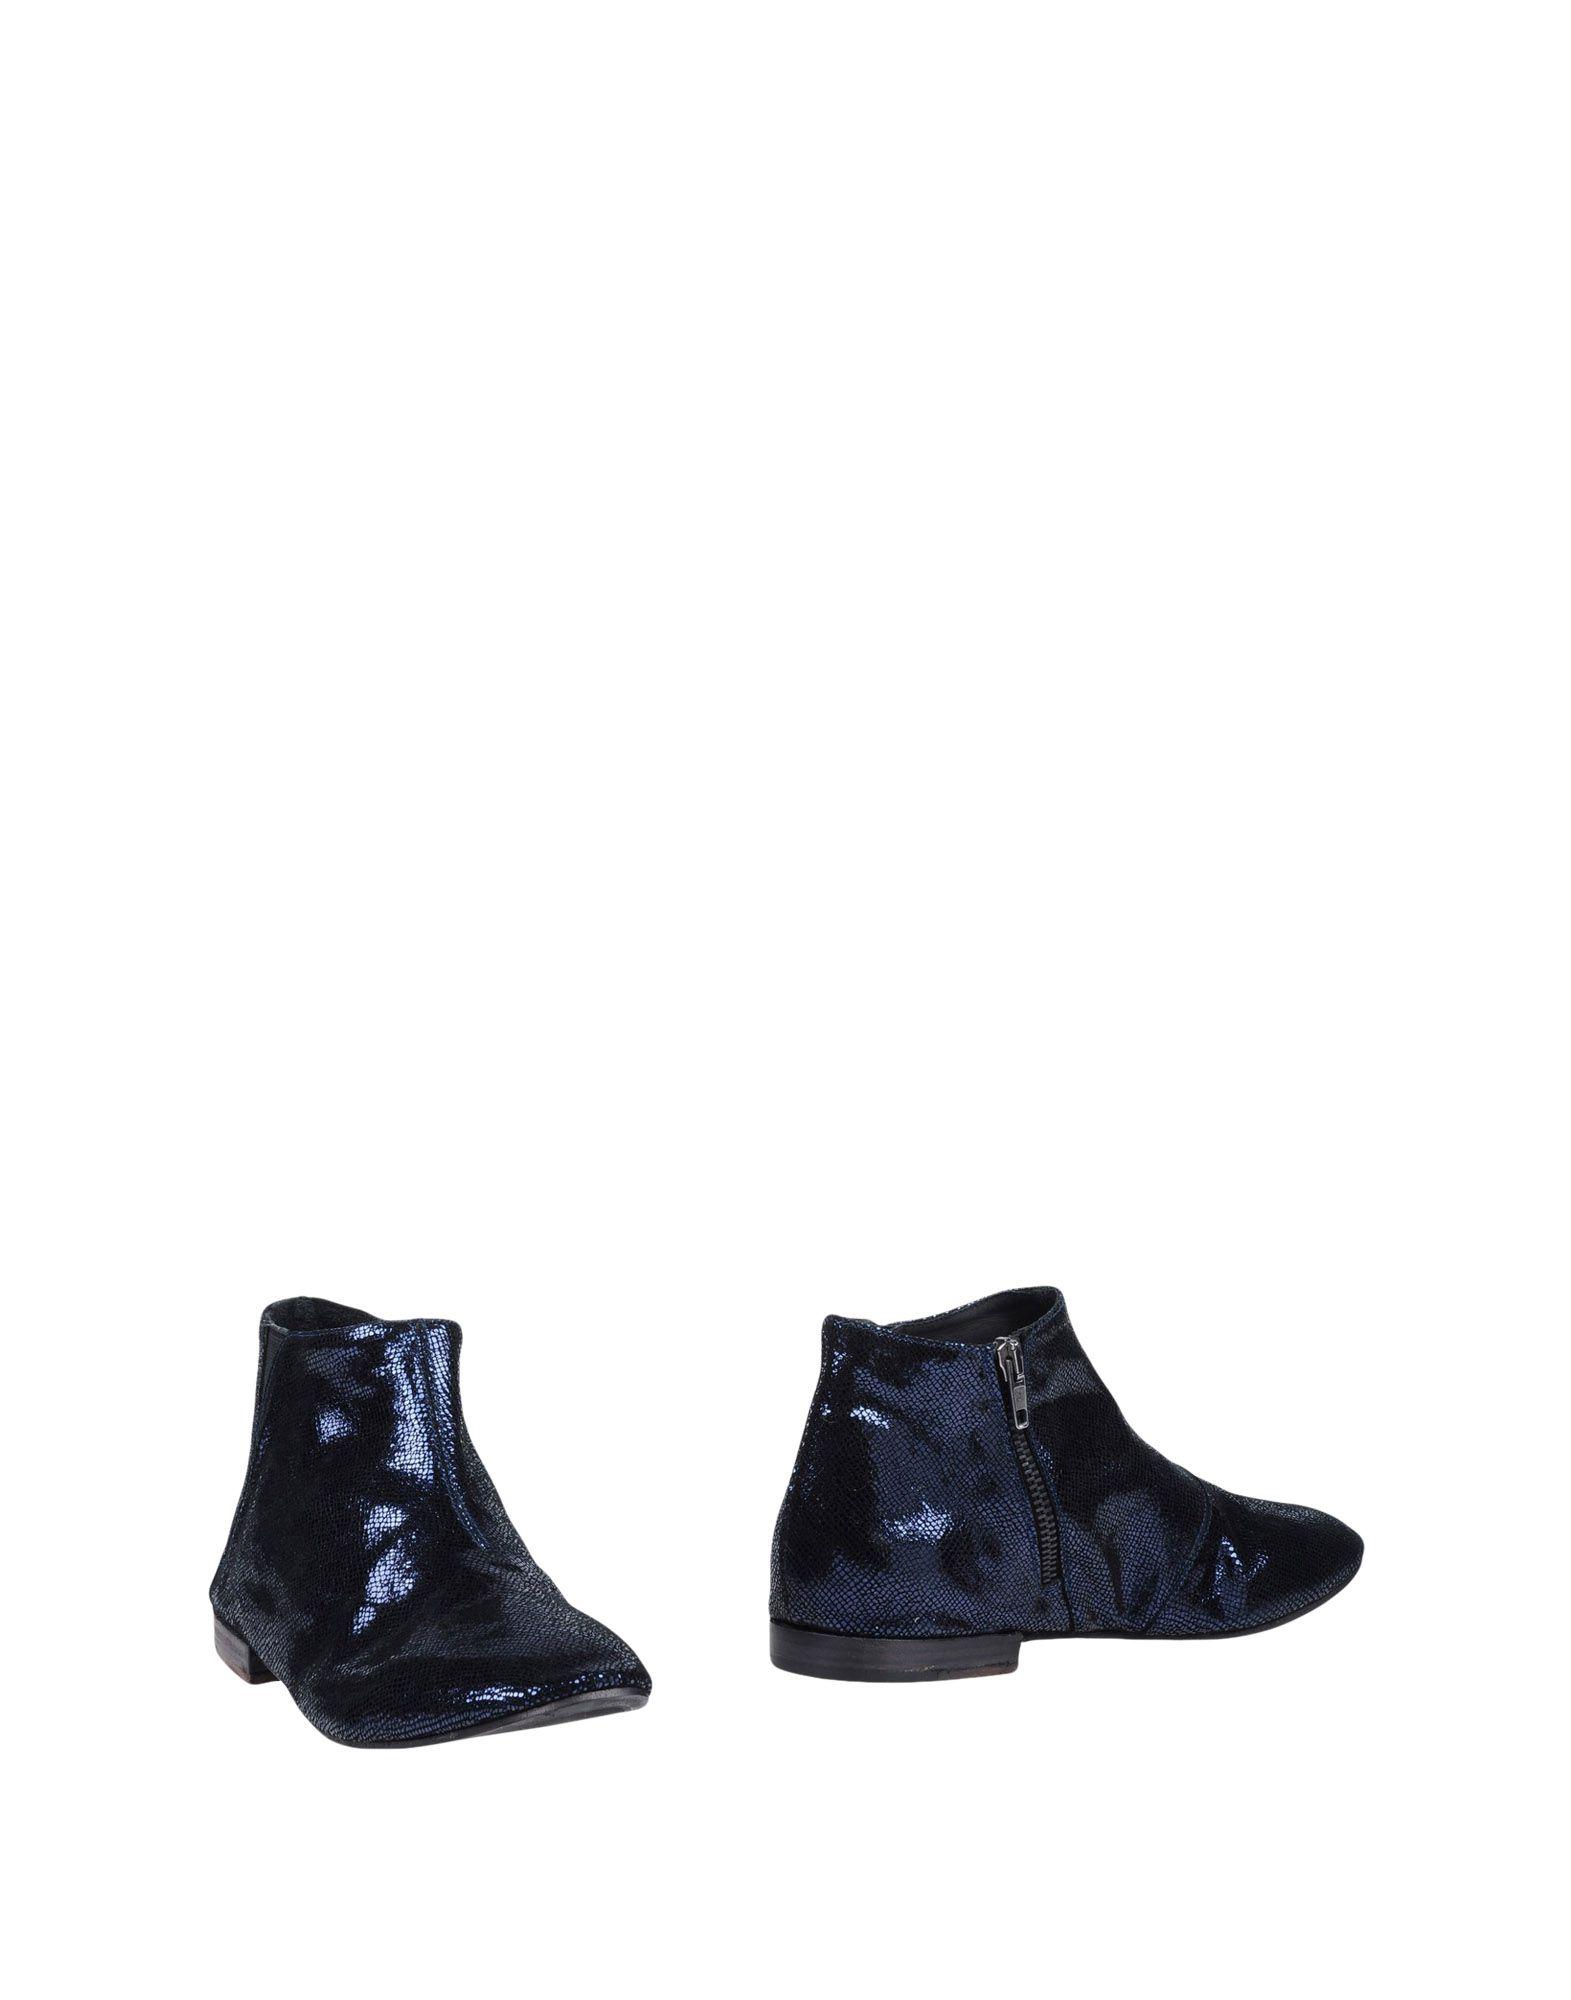 ФОТО kudetÀ Полусапоги и высокие ботинки